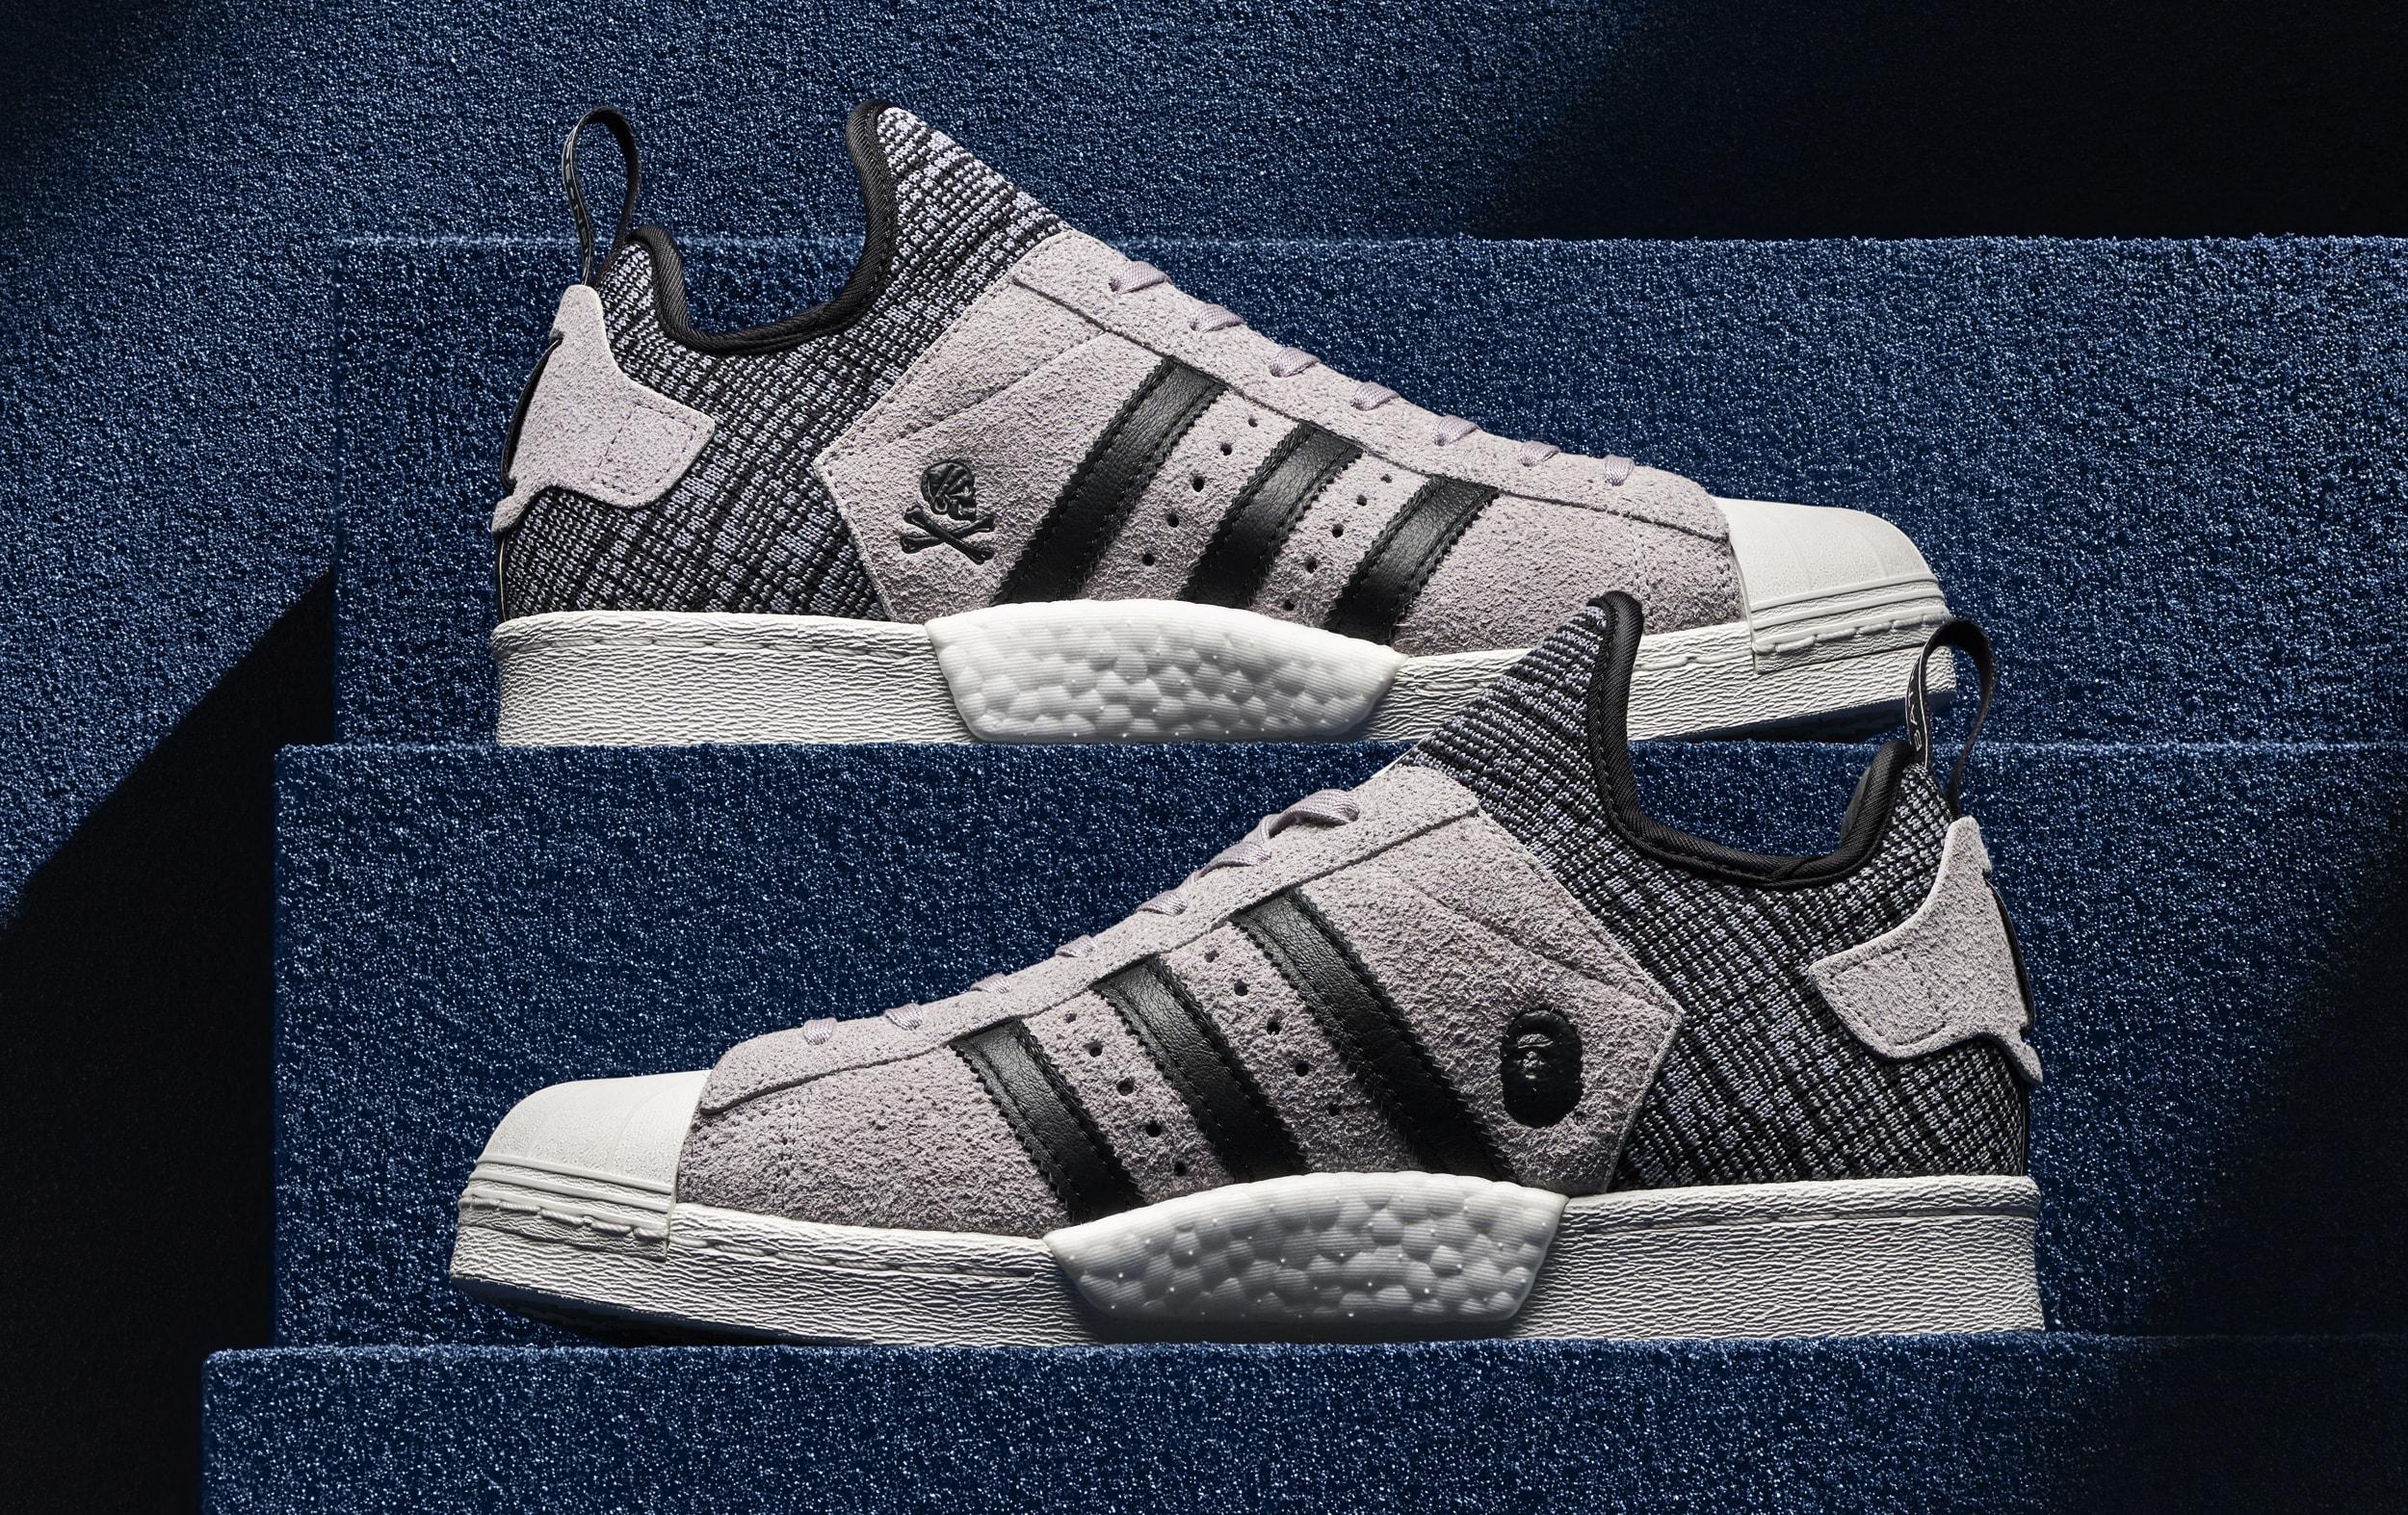 Bape Neighborhood Adidas Superstar Boost 1